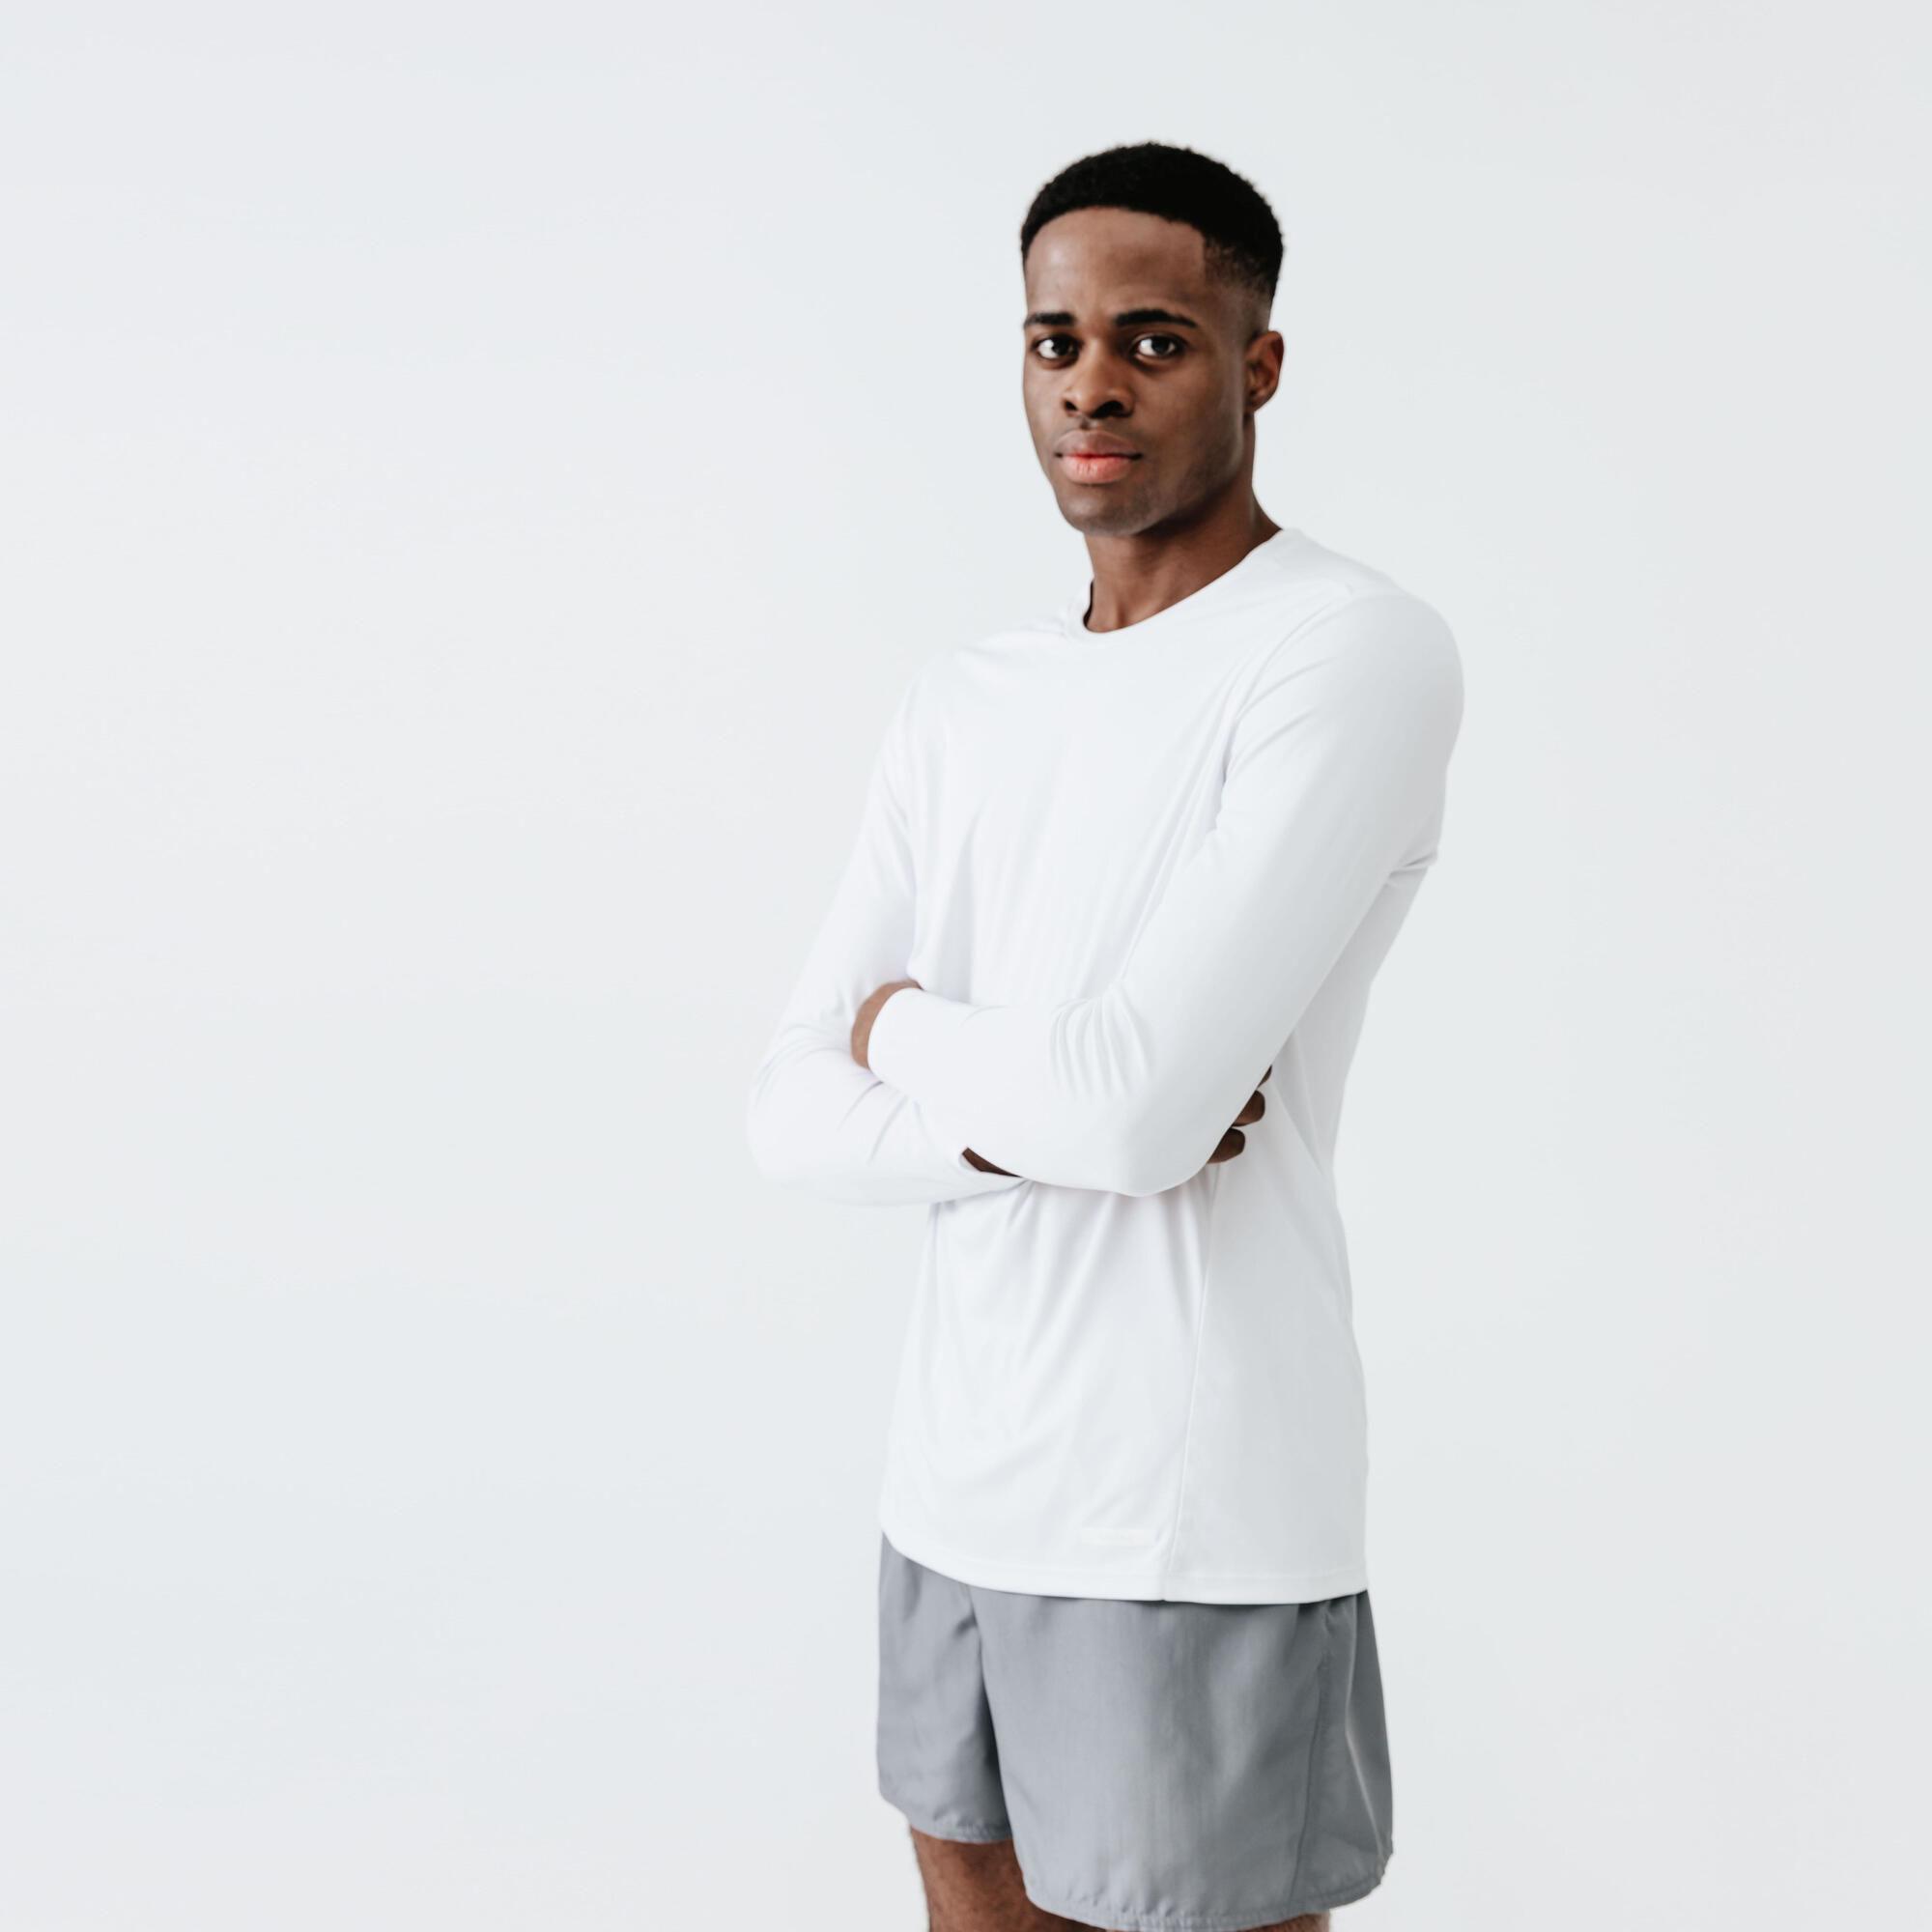 Koszulka do biegania ANTY-UV męska